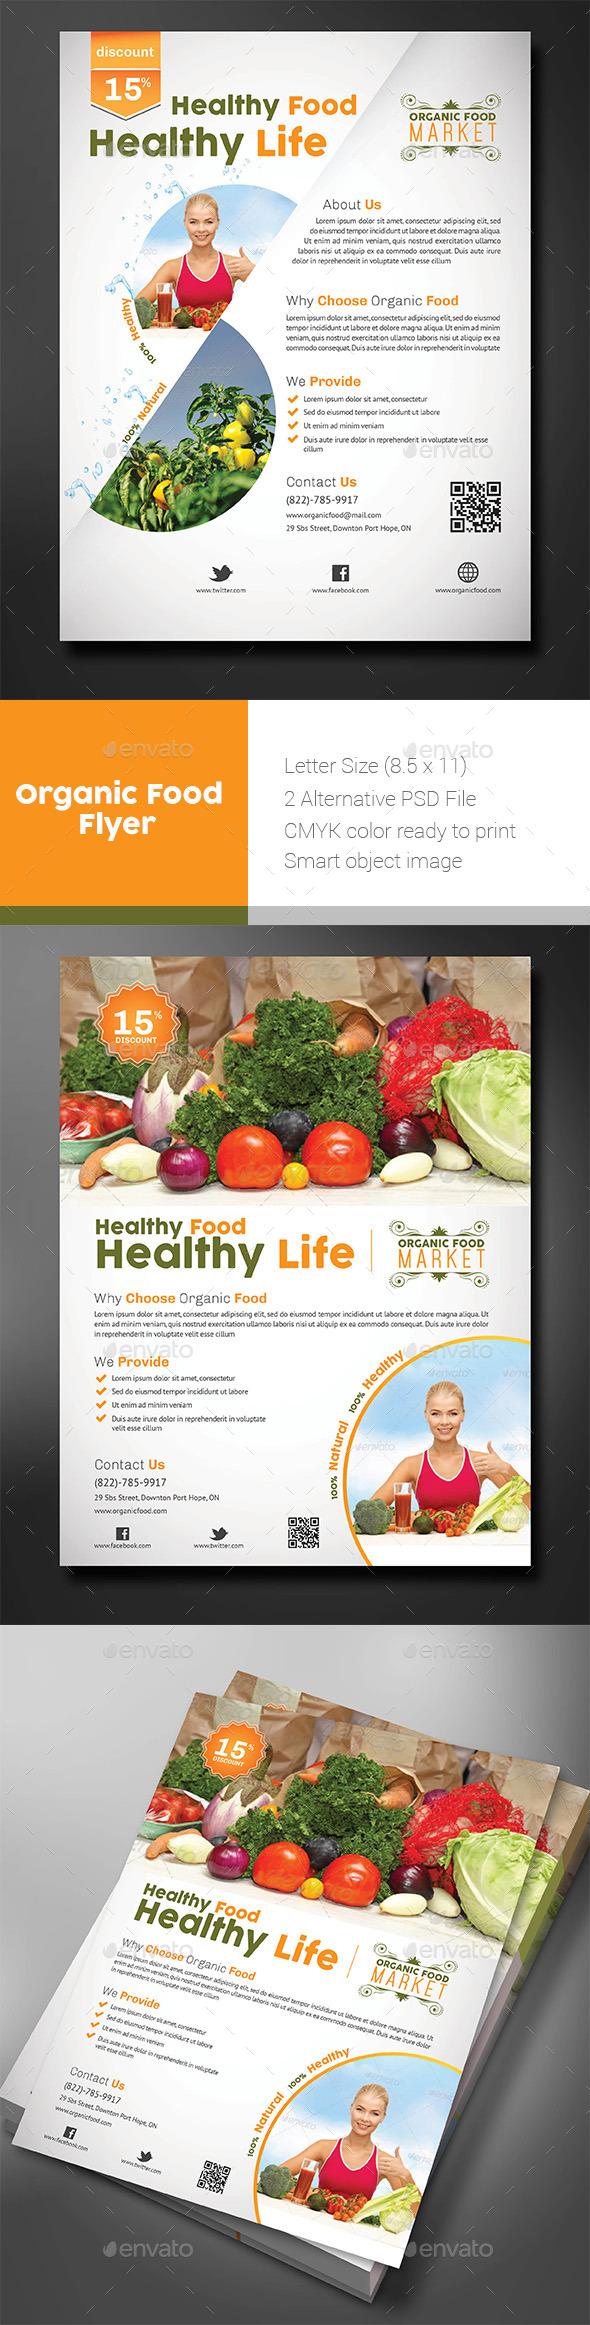 Organic Food Store Flyer - Flyers Print Templates